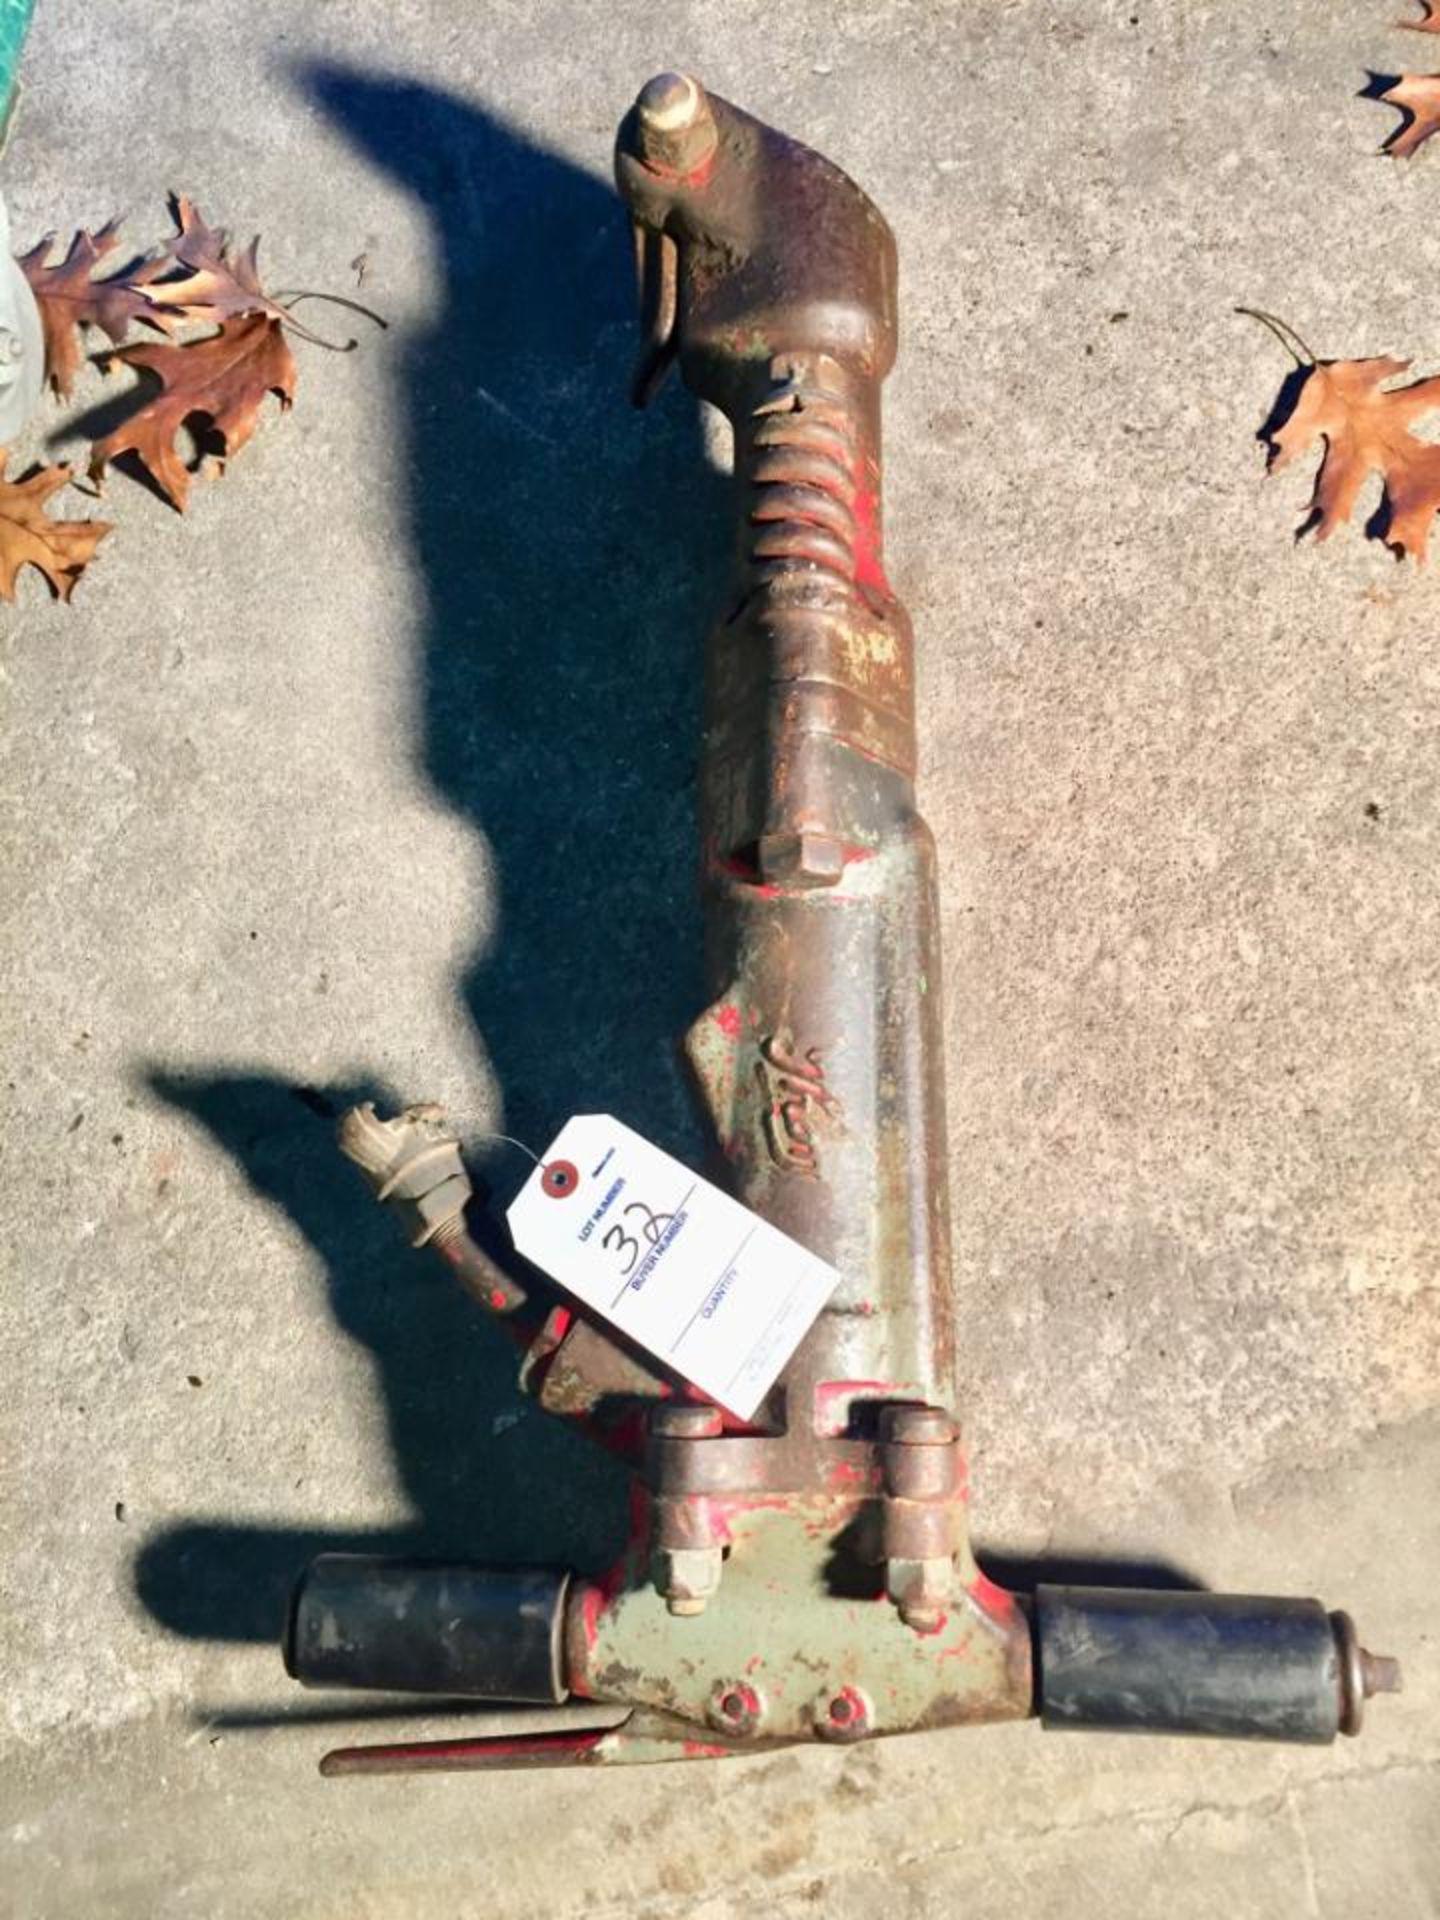 Lot 32 - (1) Thor Tools Jackhammer